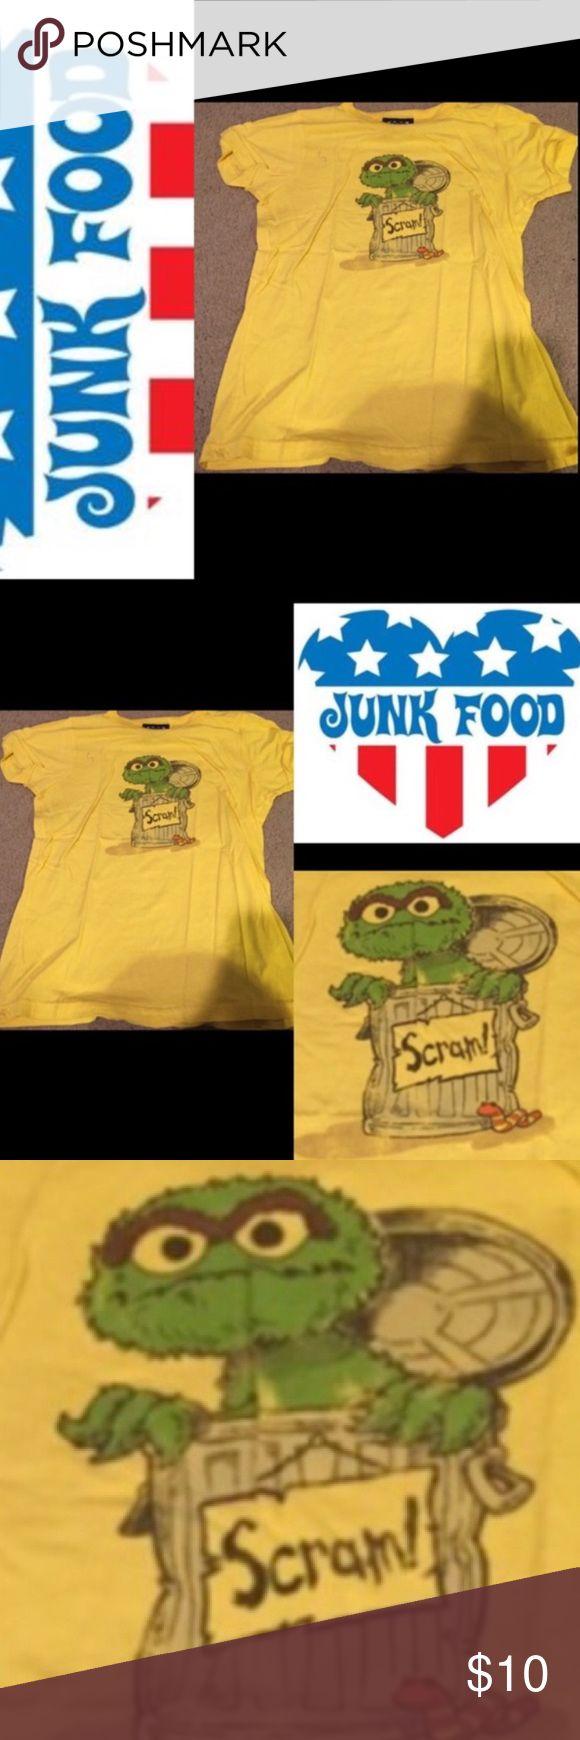 Sesame Street Oscar the grouch junk food scram tee Oscar the grouch junk food scram tee shirt in yellow. Sesame Street Junk Food Tops Tees - Short Sleeve